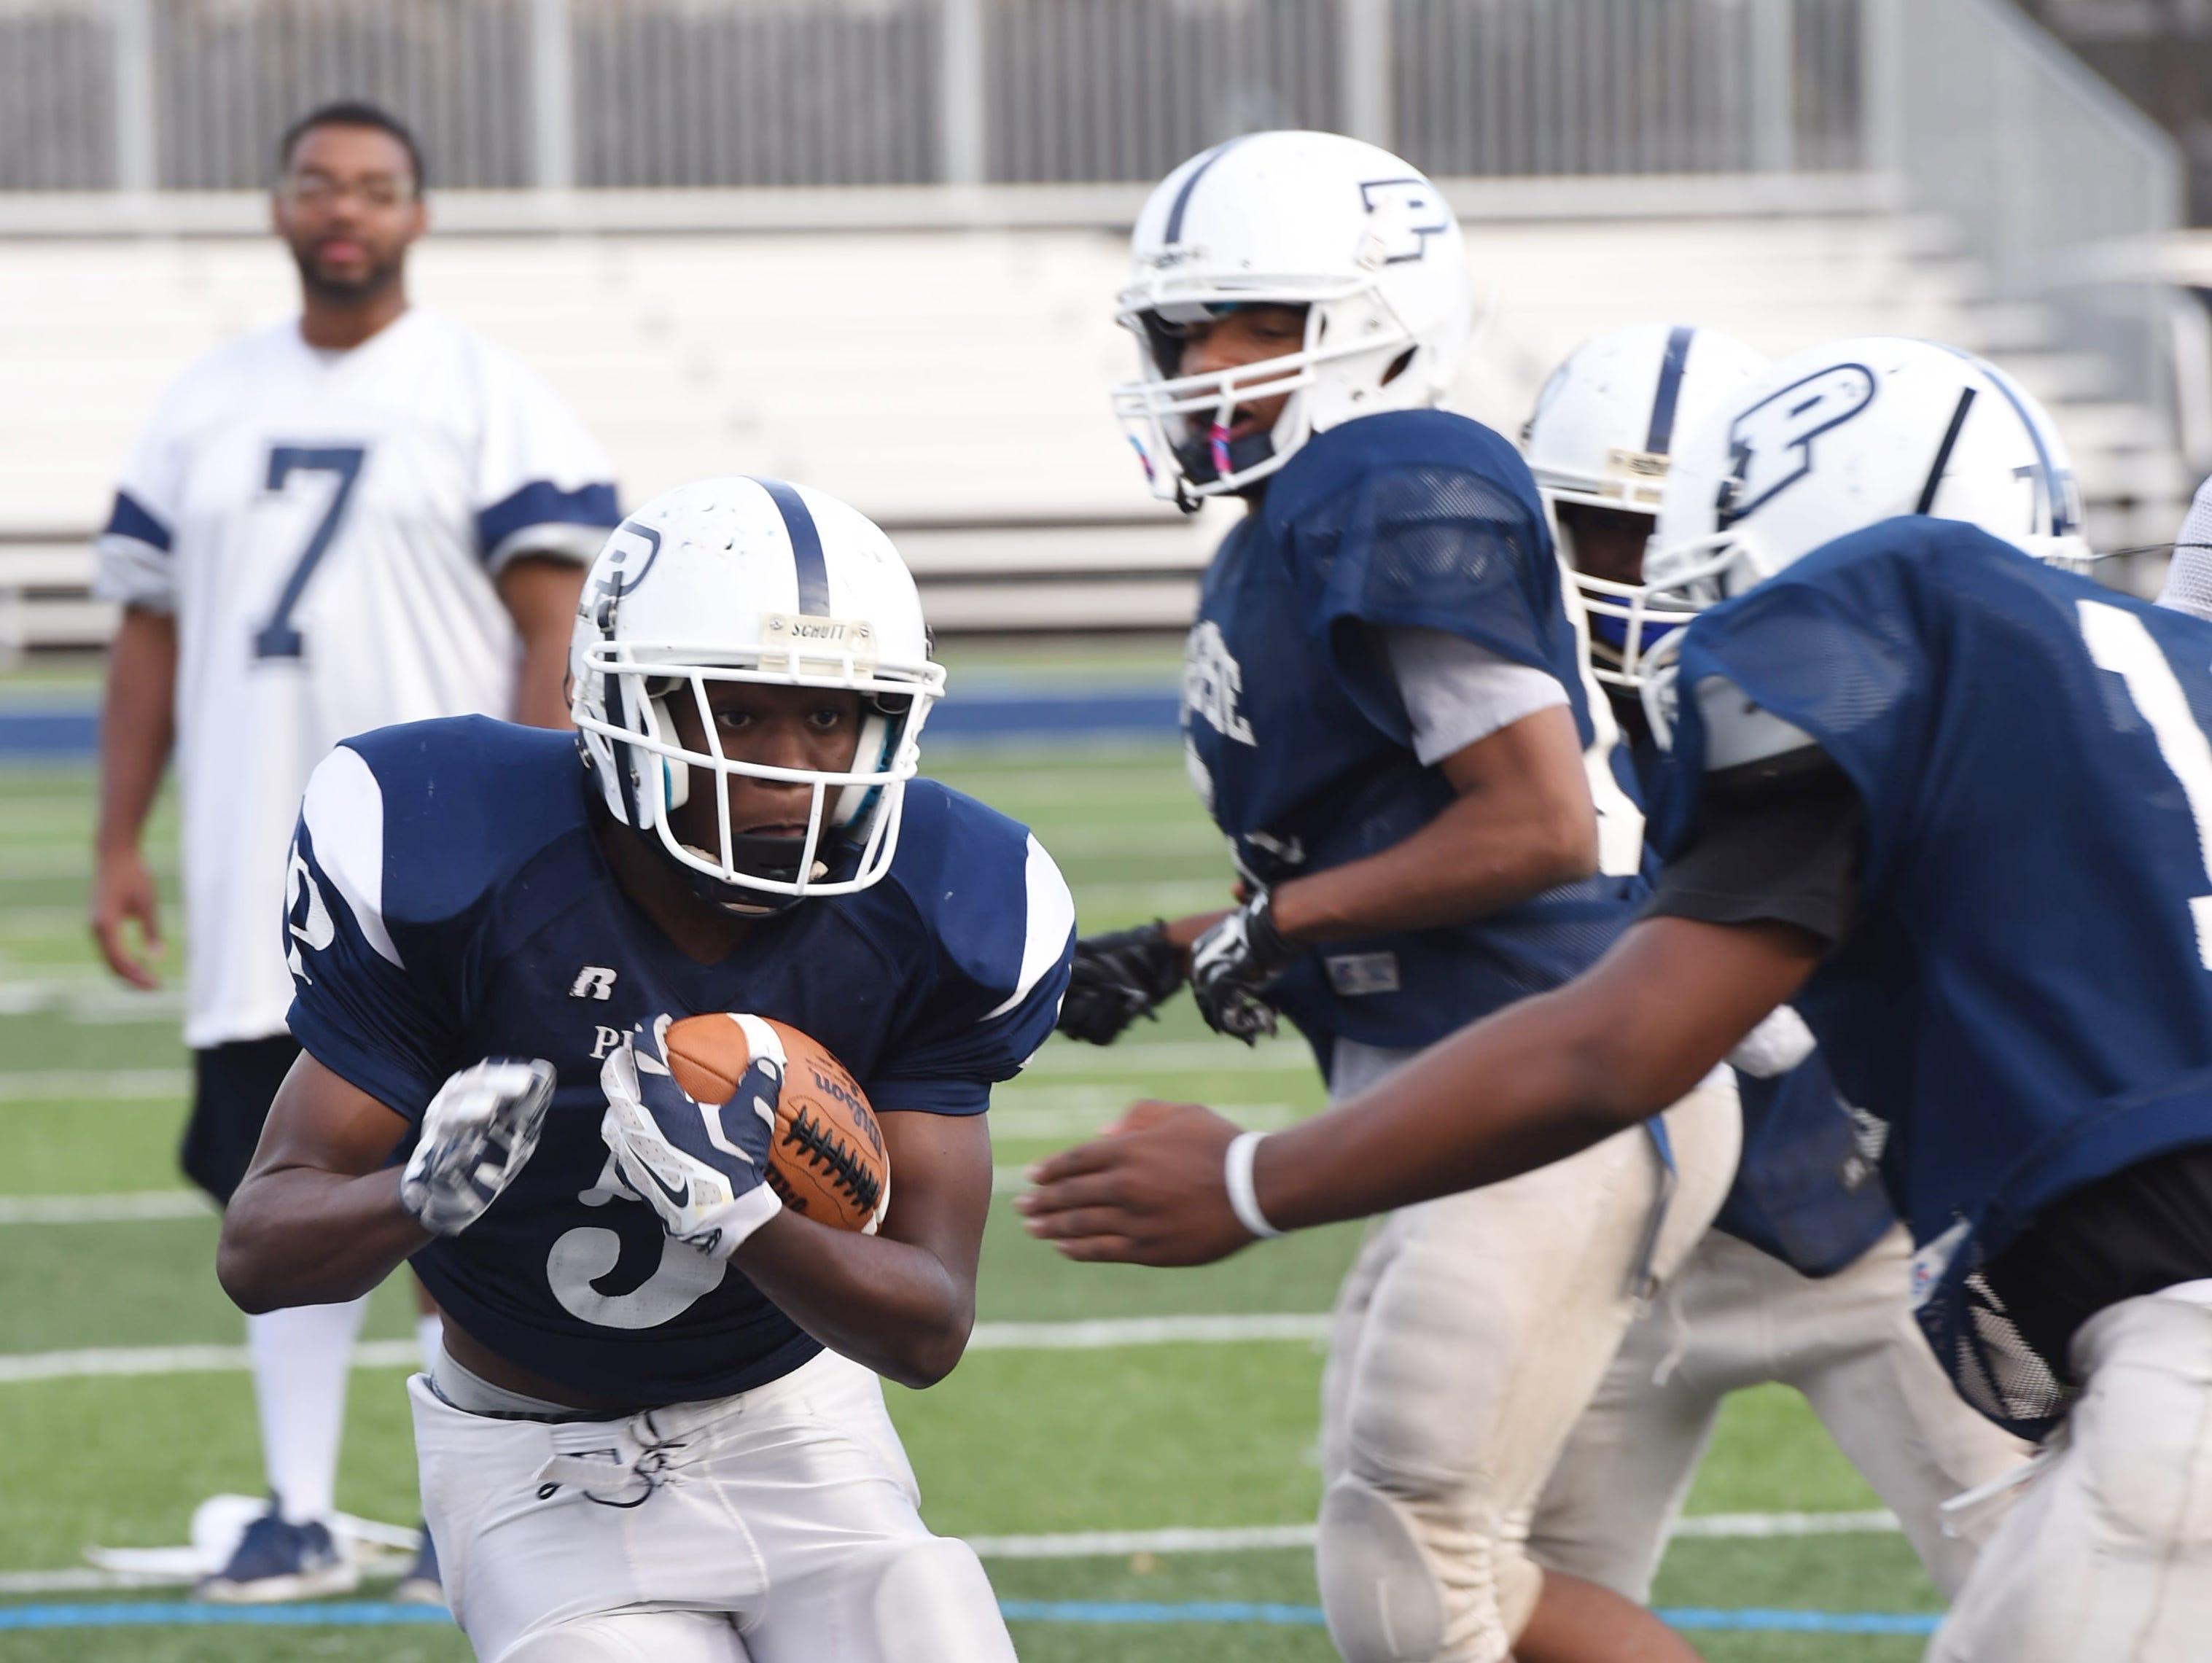 Poughkeepsie's Shaquez Nesbitt runs a play during practice at Poughkeepsie High School on Wednesday.